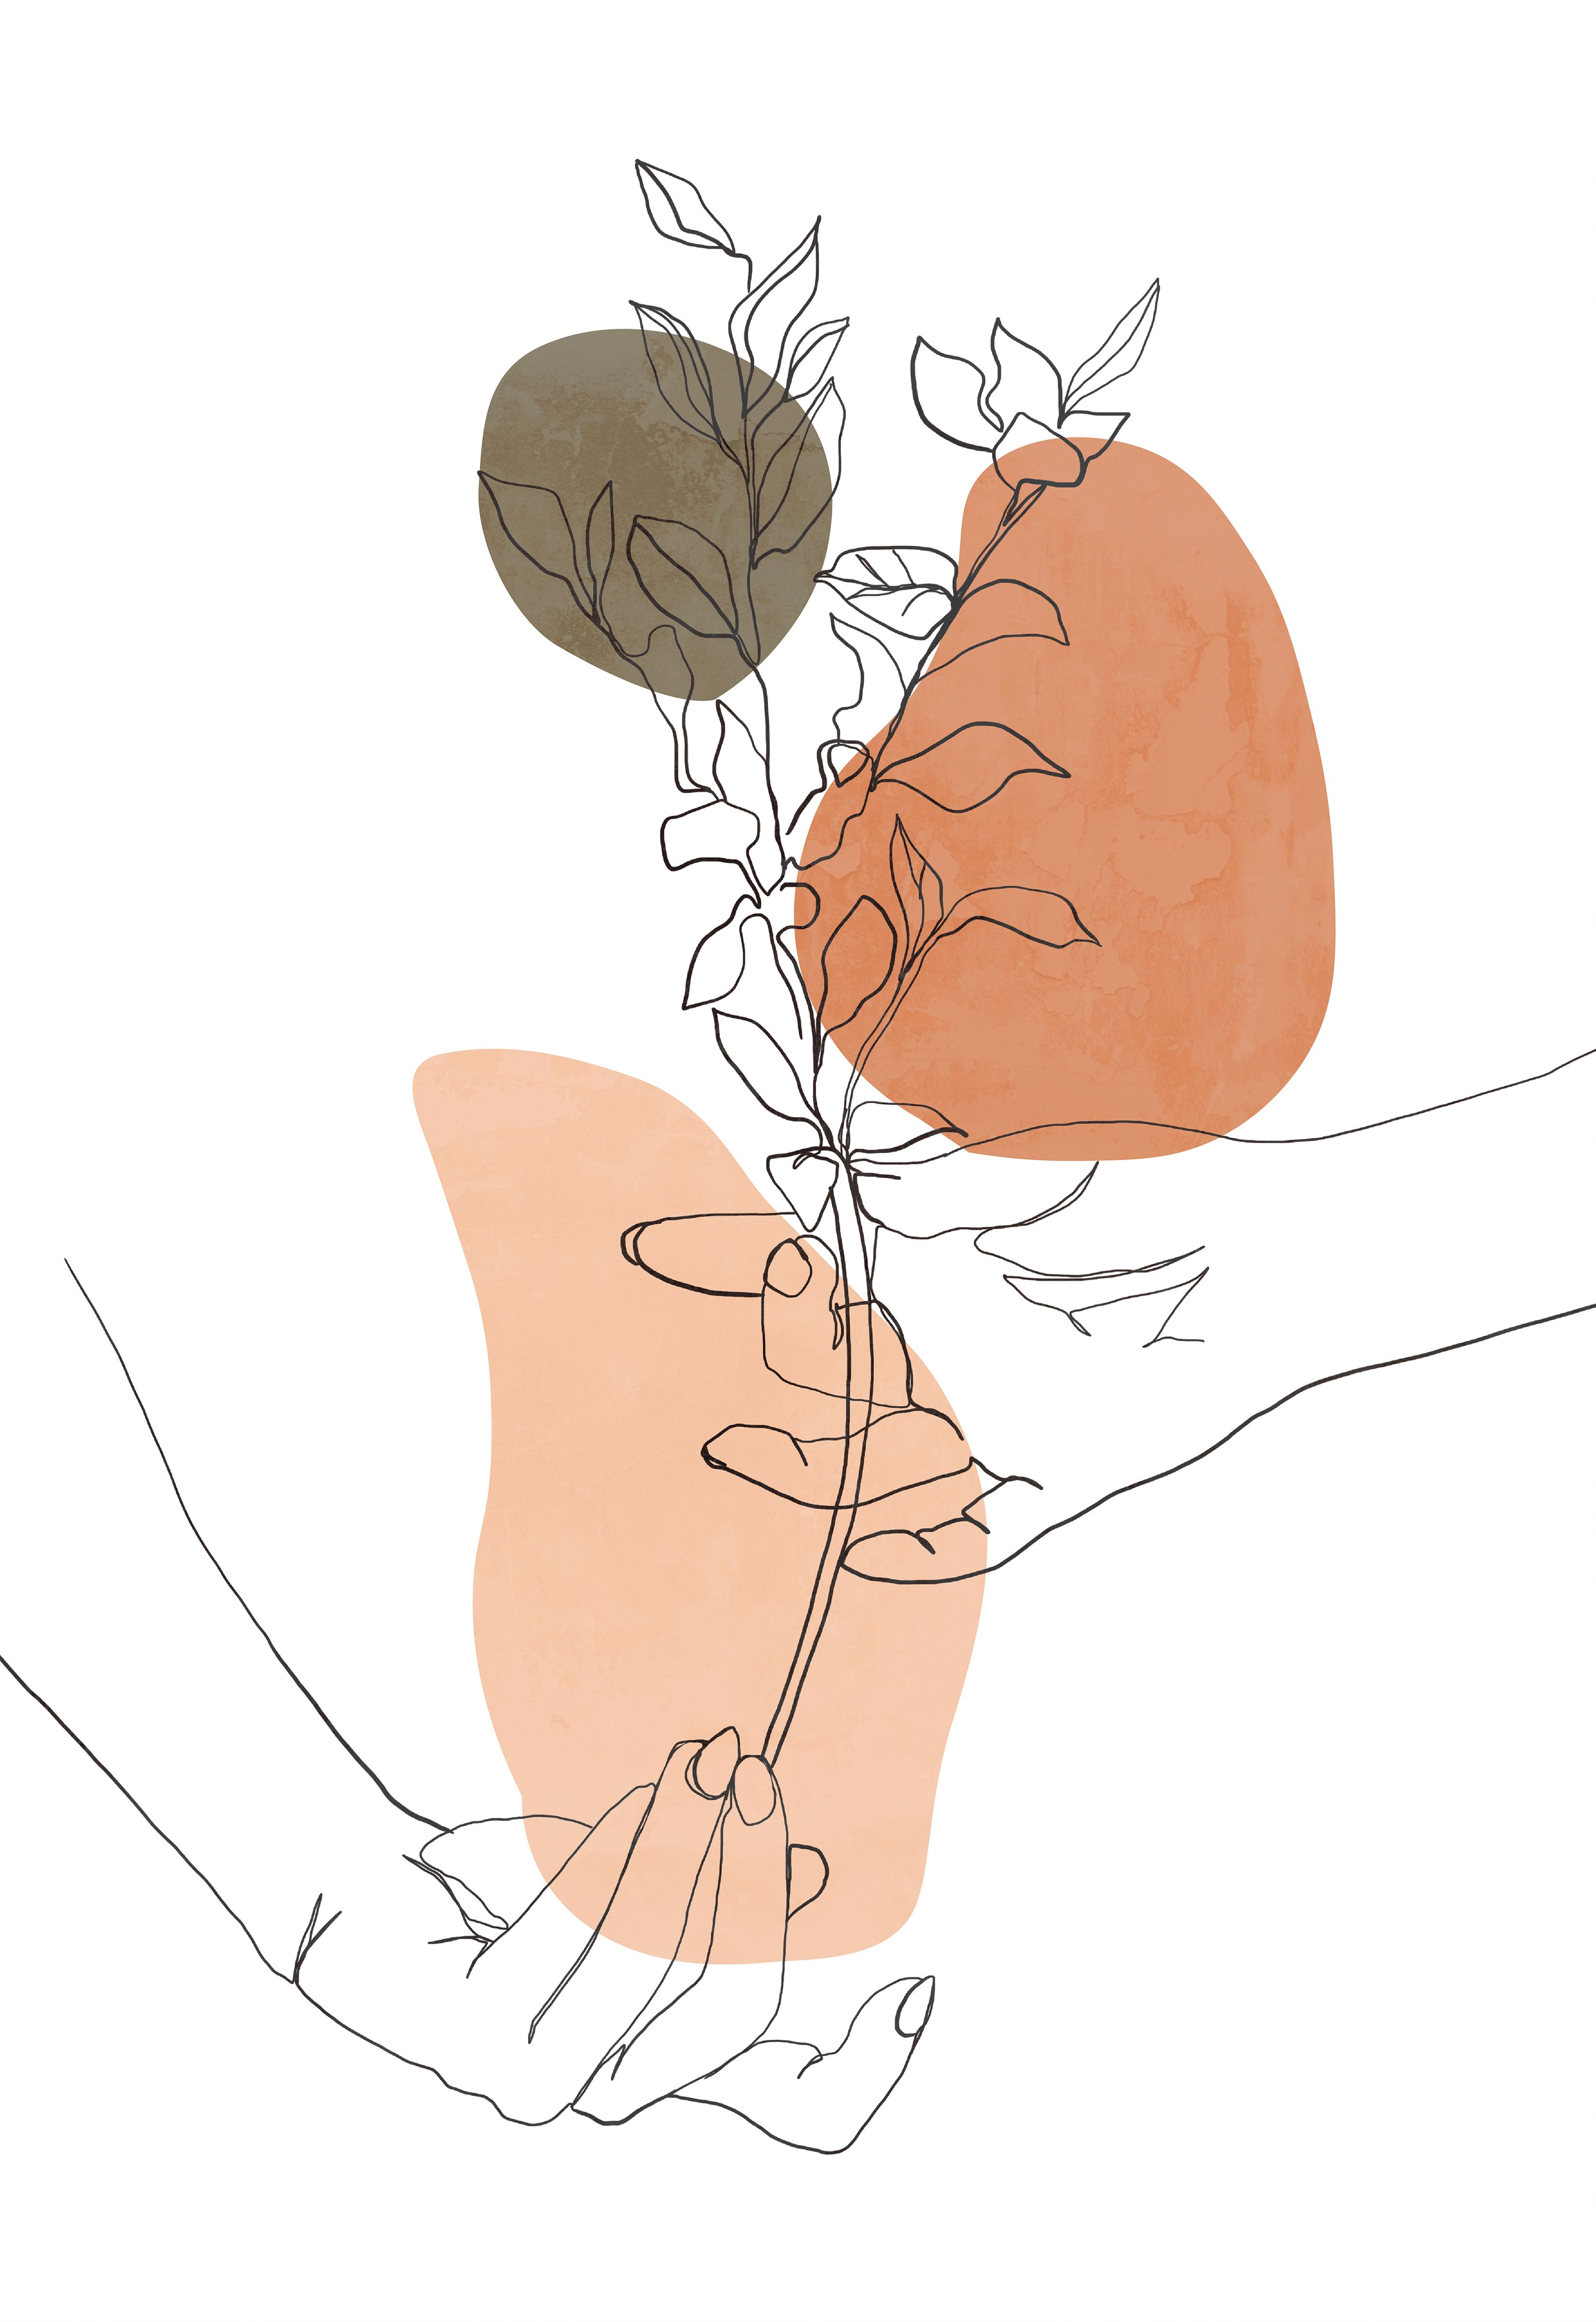 Minimalist line art hands, plant poster